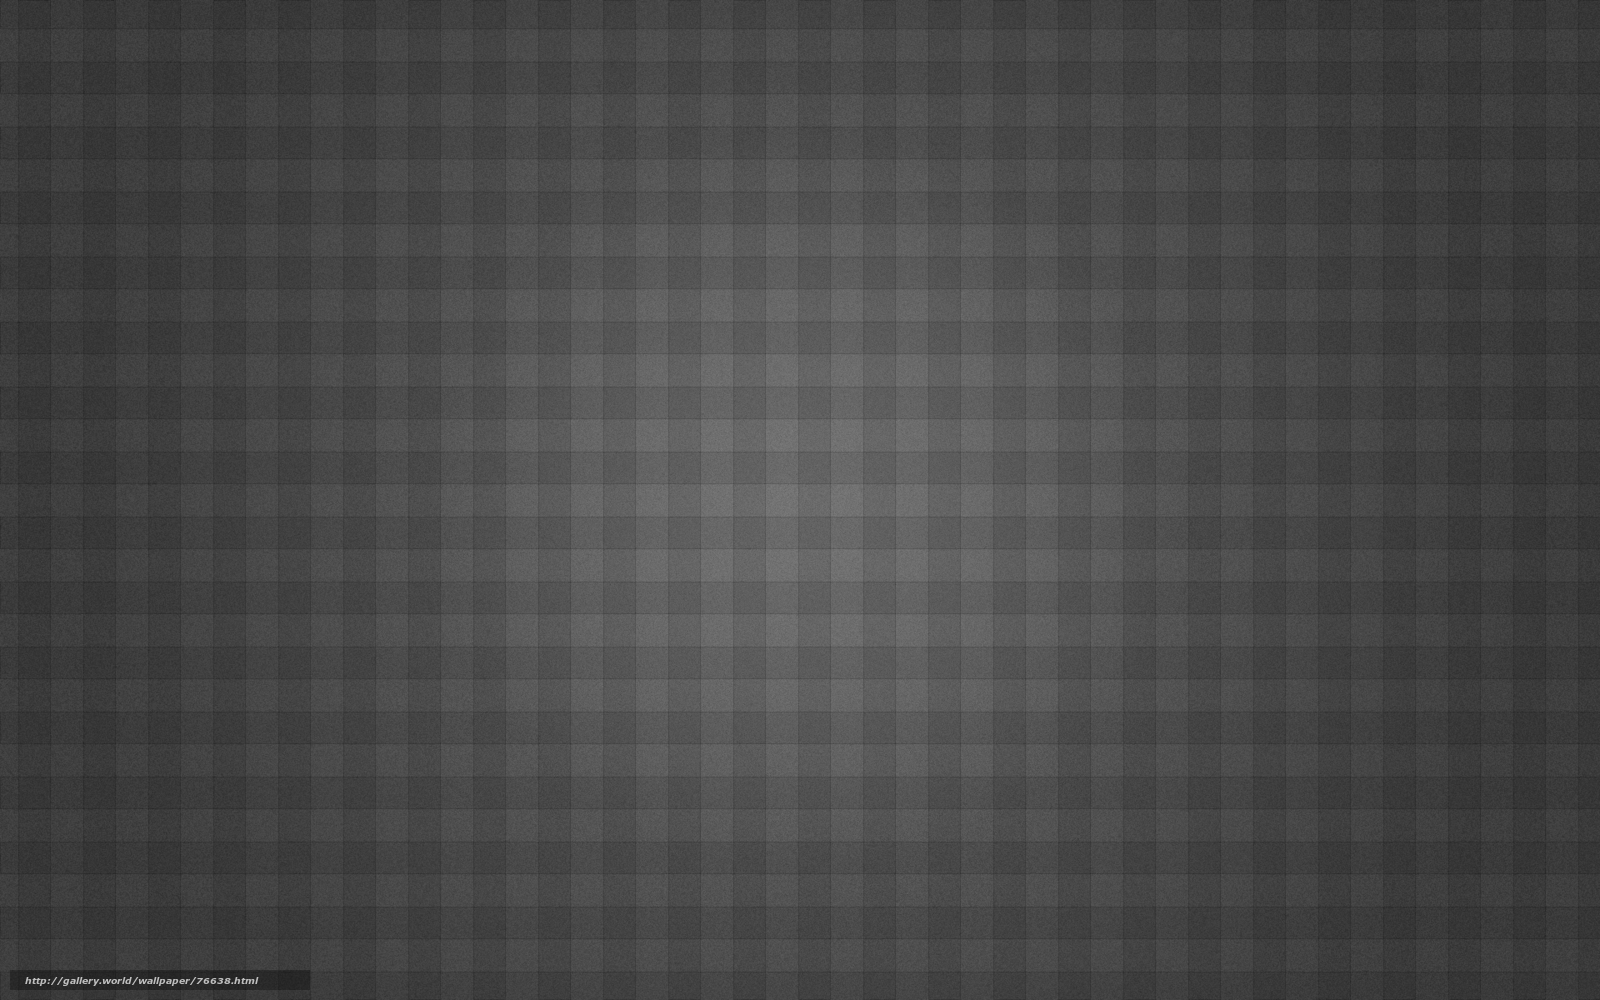 baixar wallpaper fundo preto - photo #7